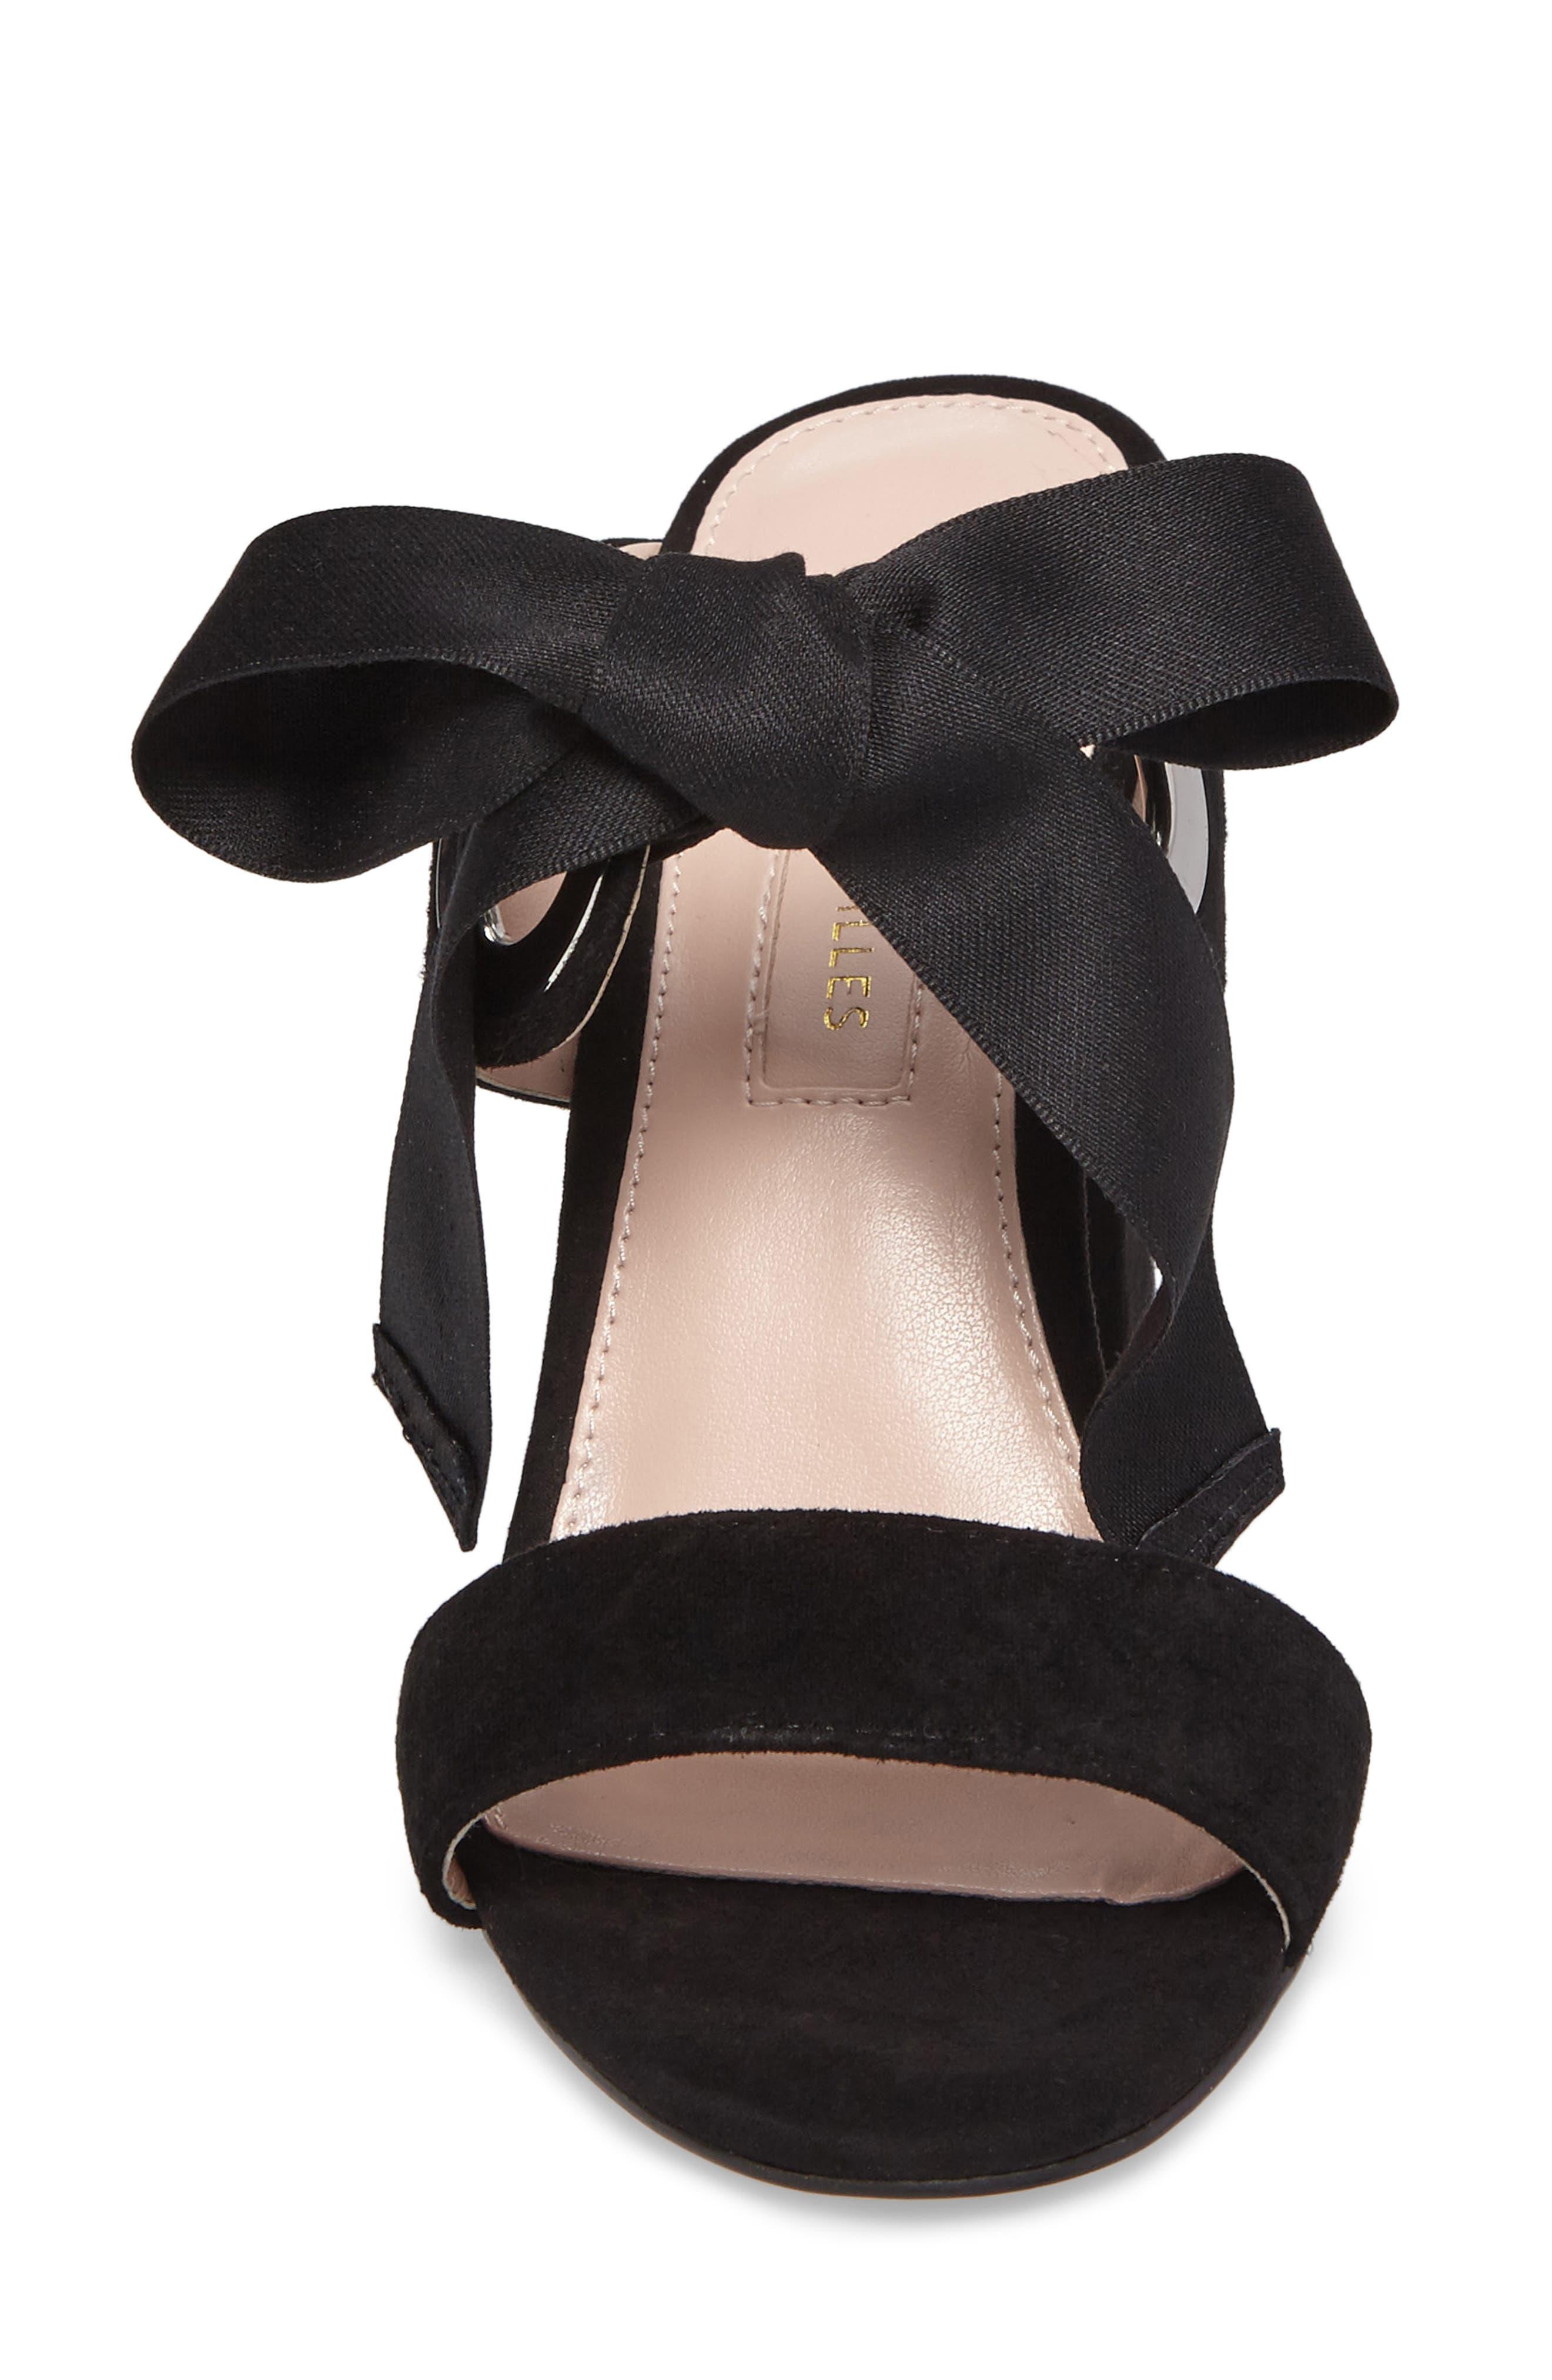 Megan Tie Strap Sandal,                             Alternate thumbnail 7, color,